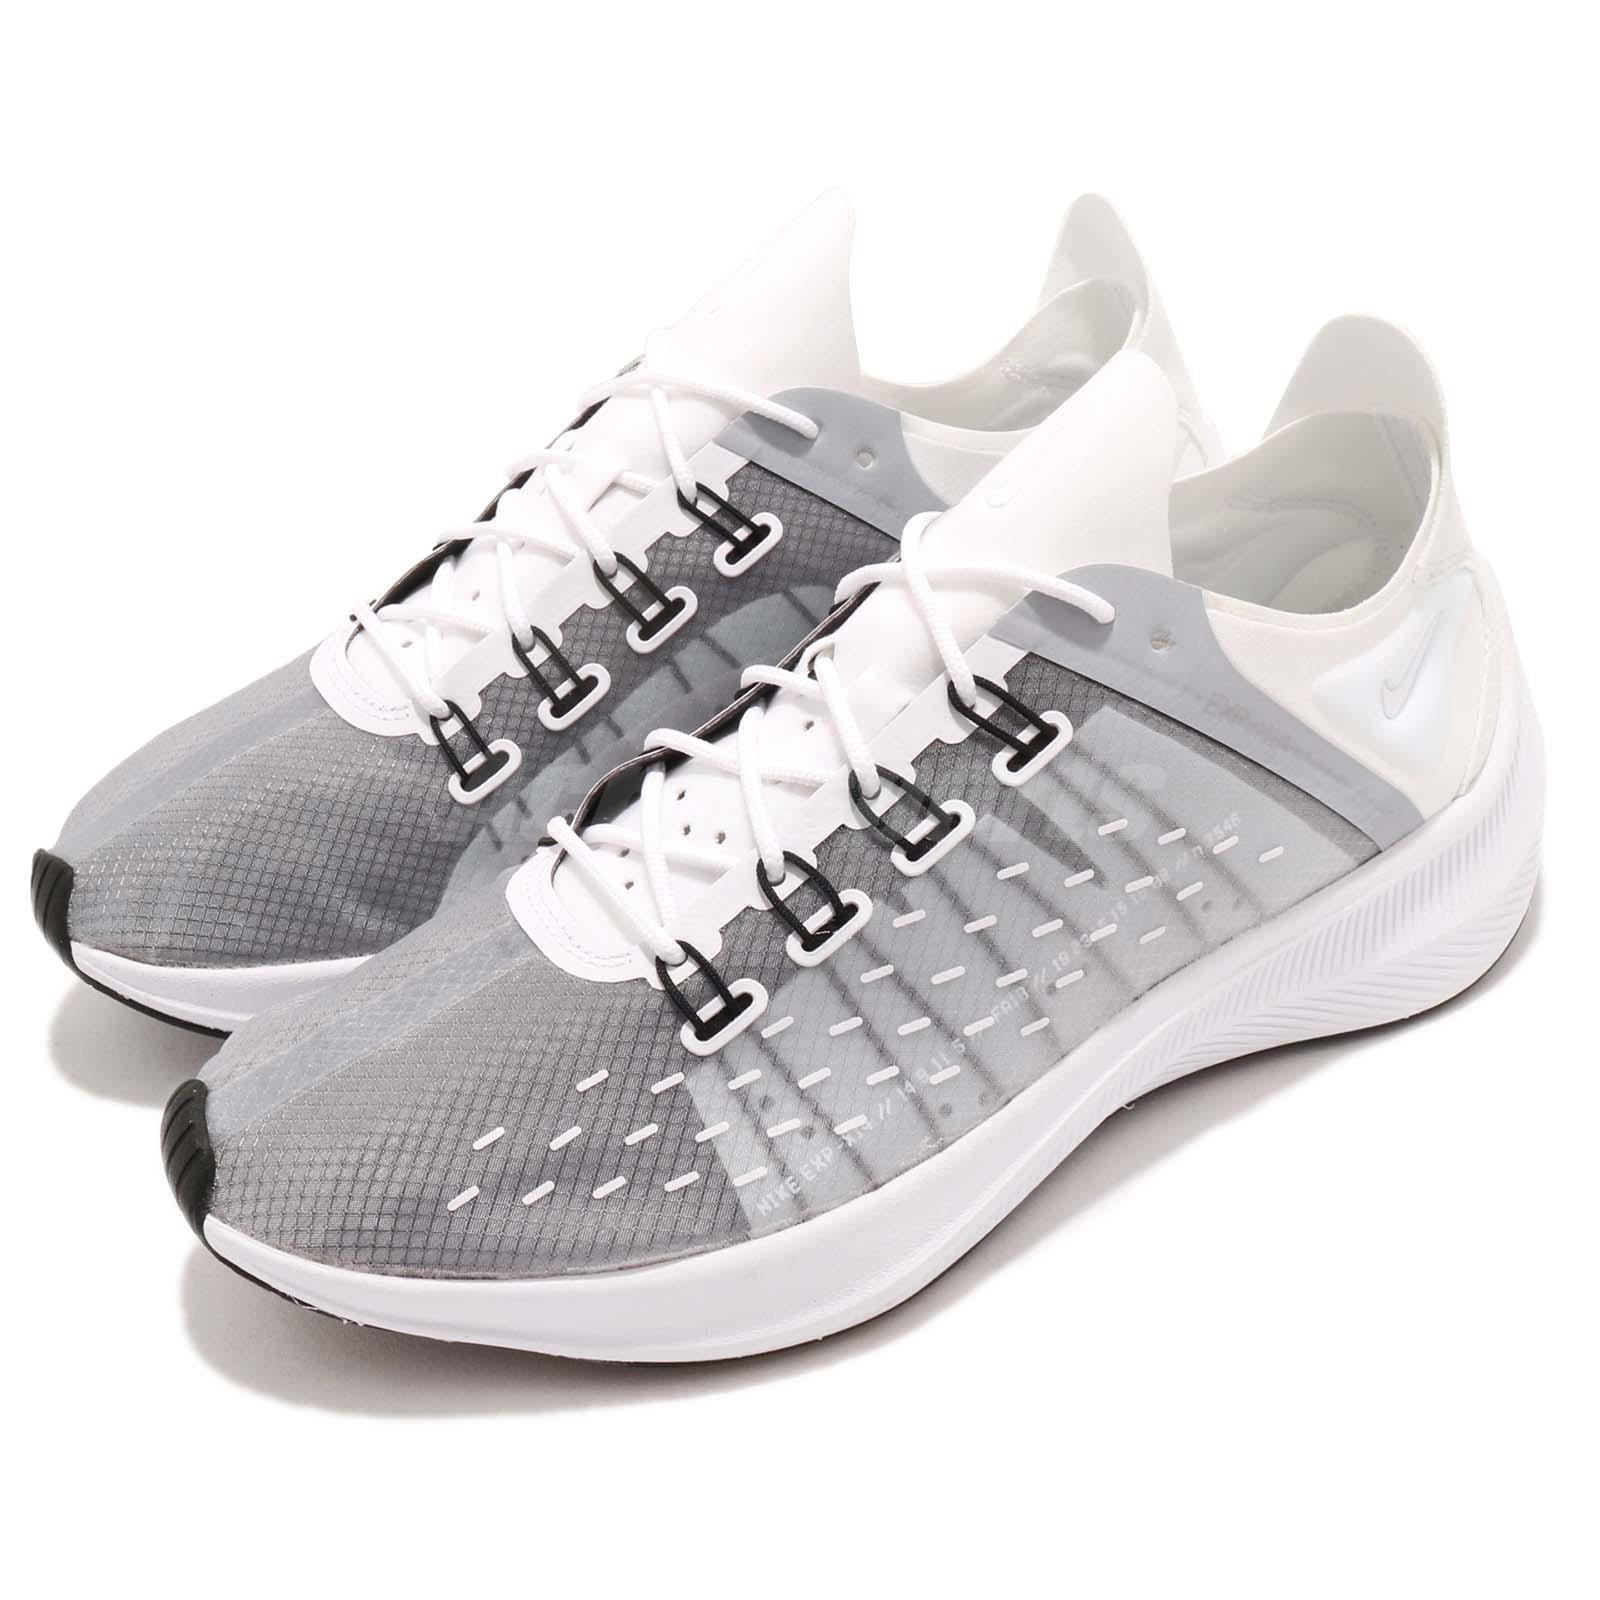 Tenis Nike W EXP-X14 Branco/Cinza nº 33